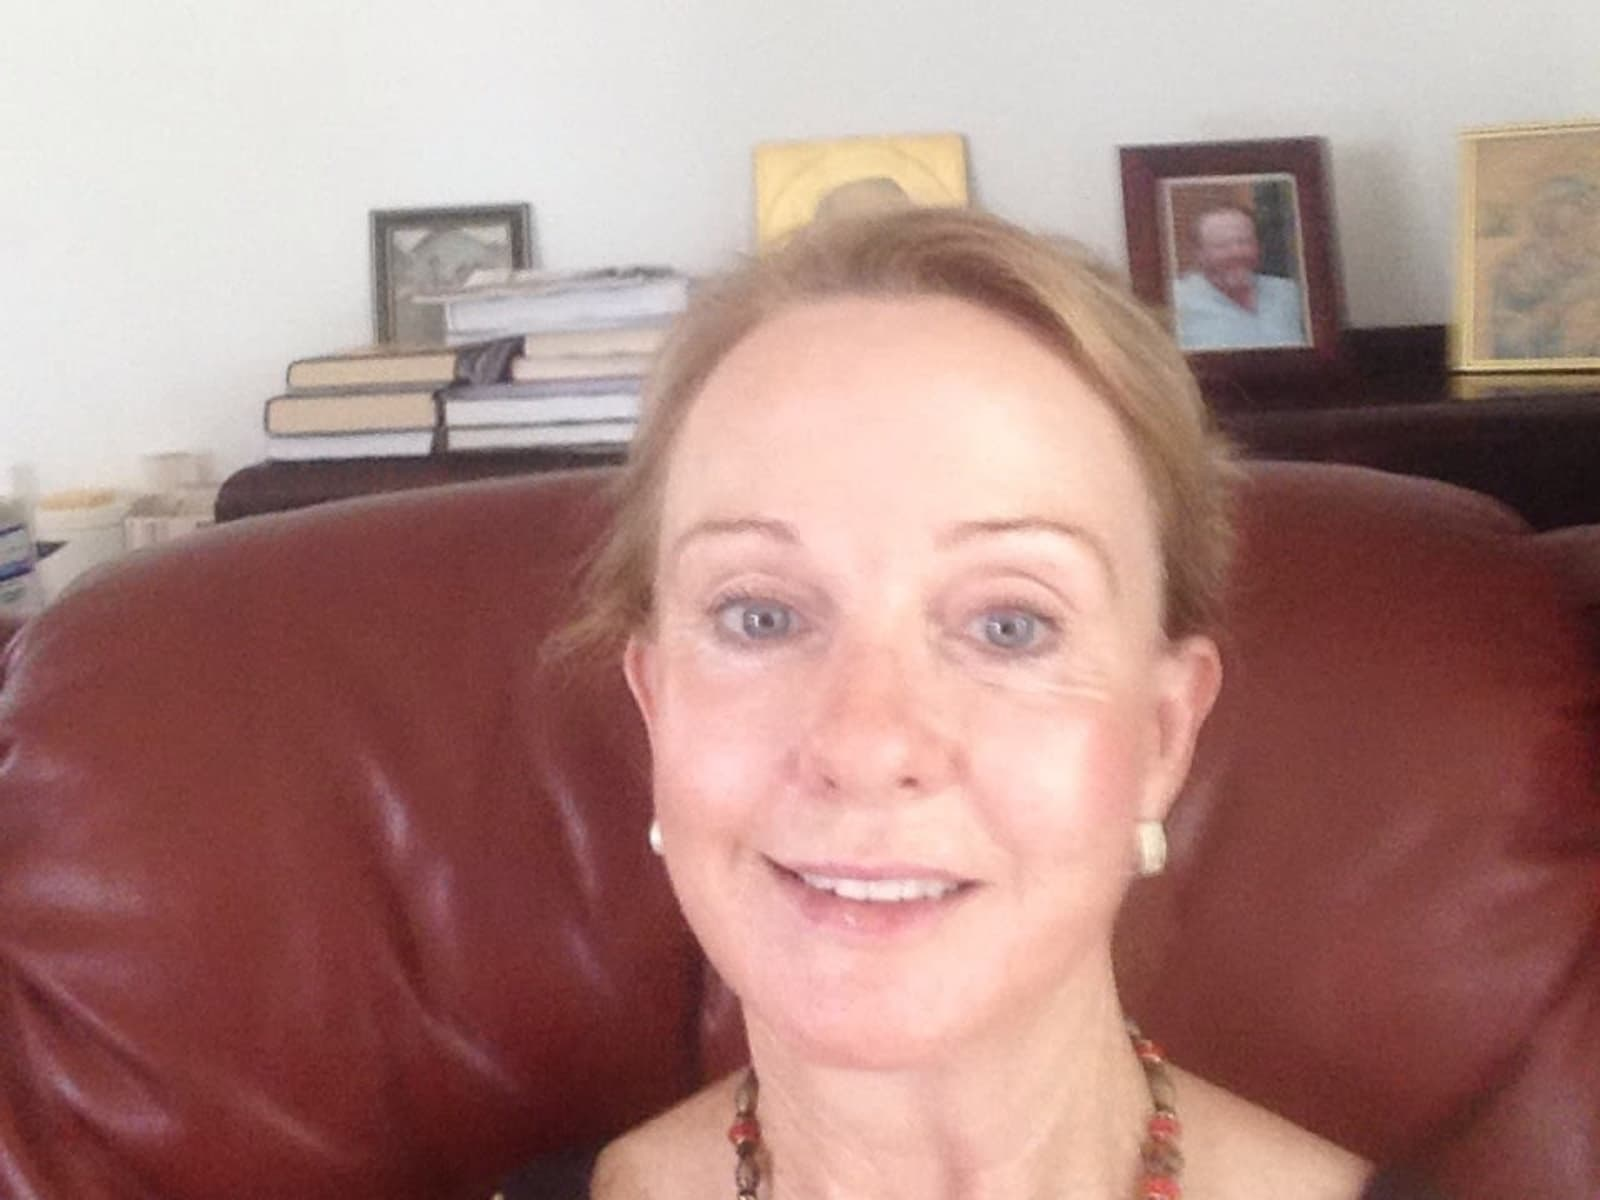 Roslyn from Ballina, New South Wales, Australia